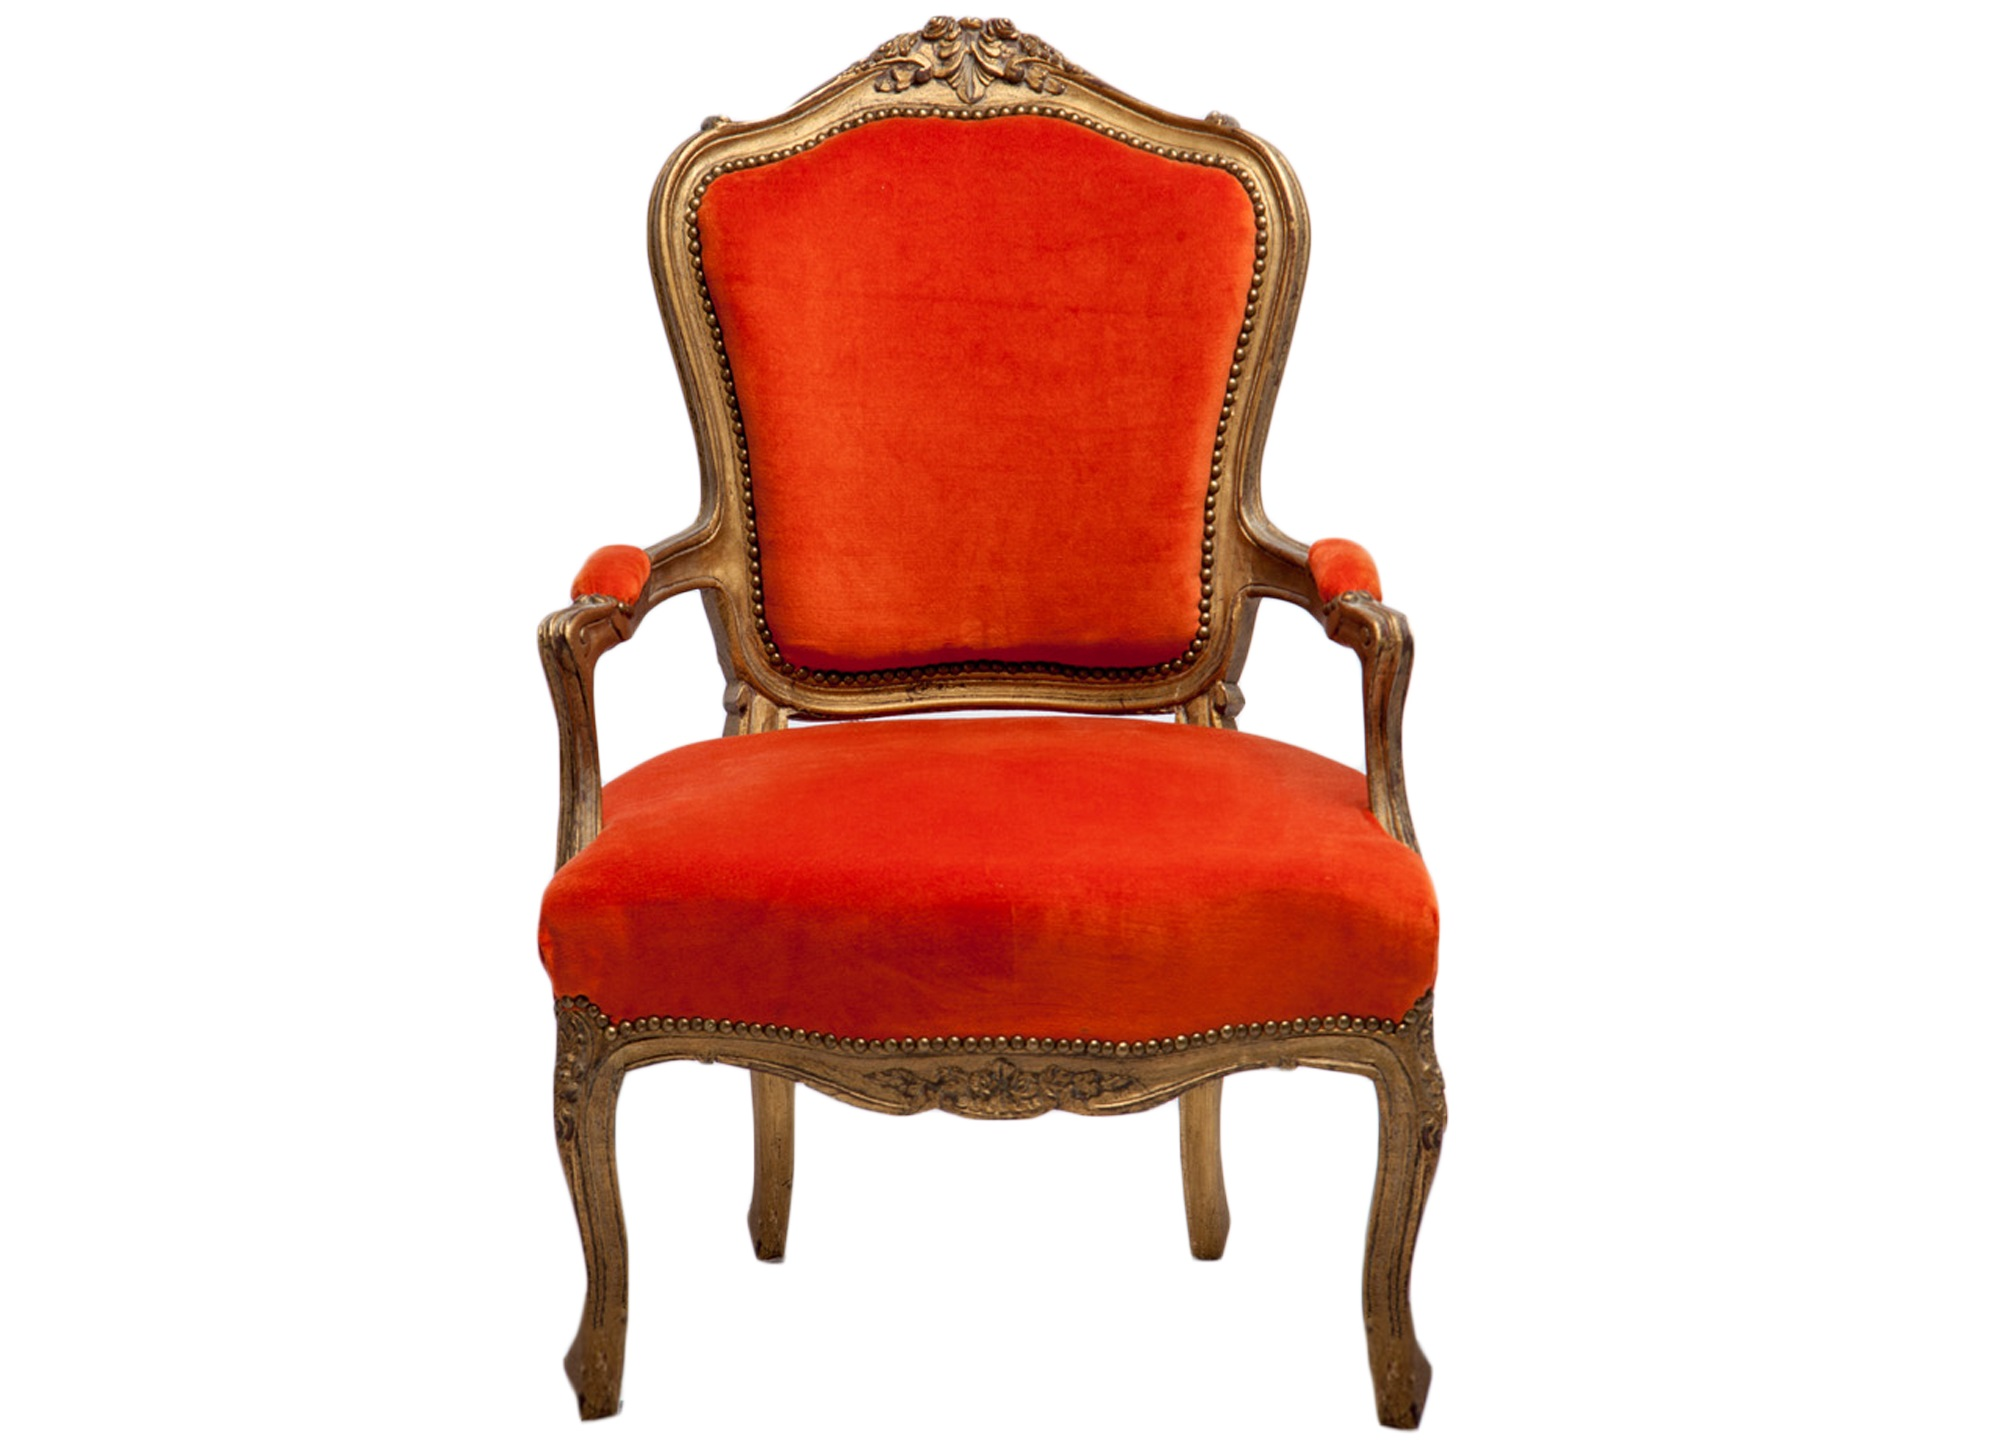 КреслоИнтерьерные кресла<br><br><br>Material: Бархат<br>Width см: 63<br>Depth см: 56<br>Height см: 99